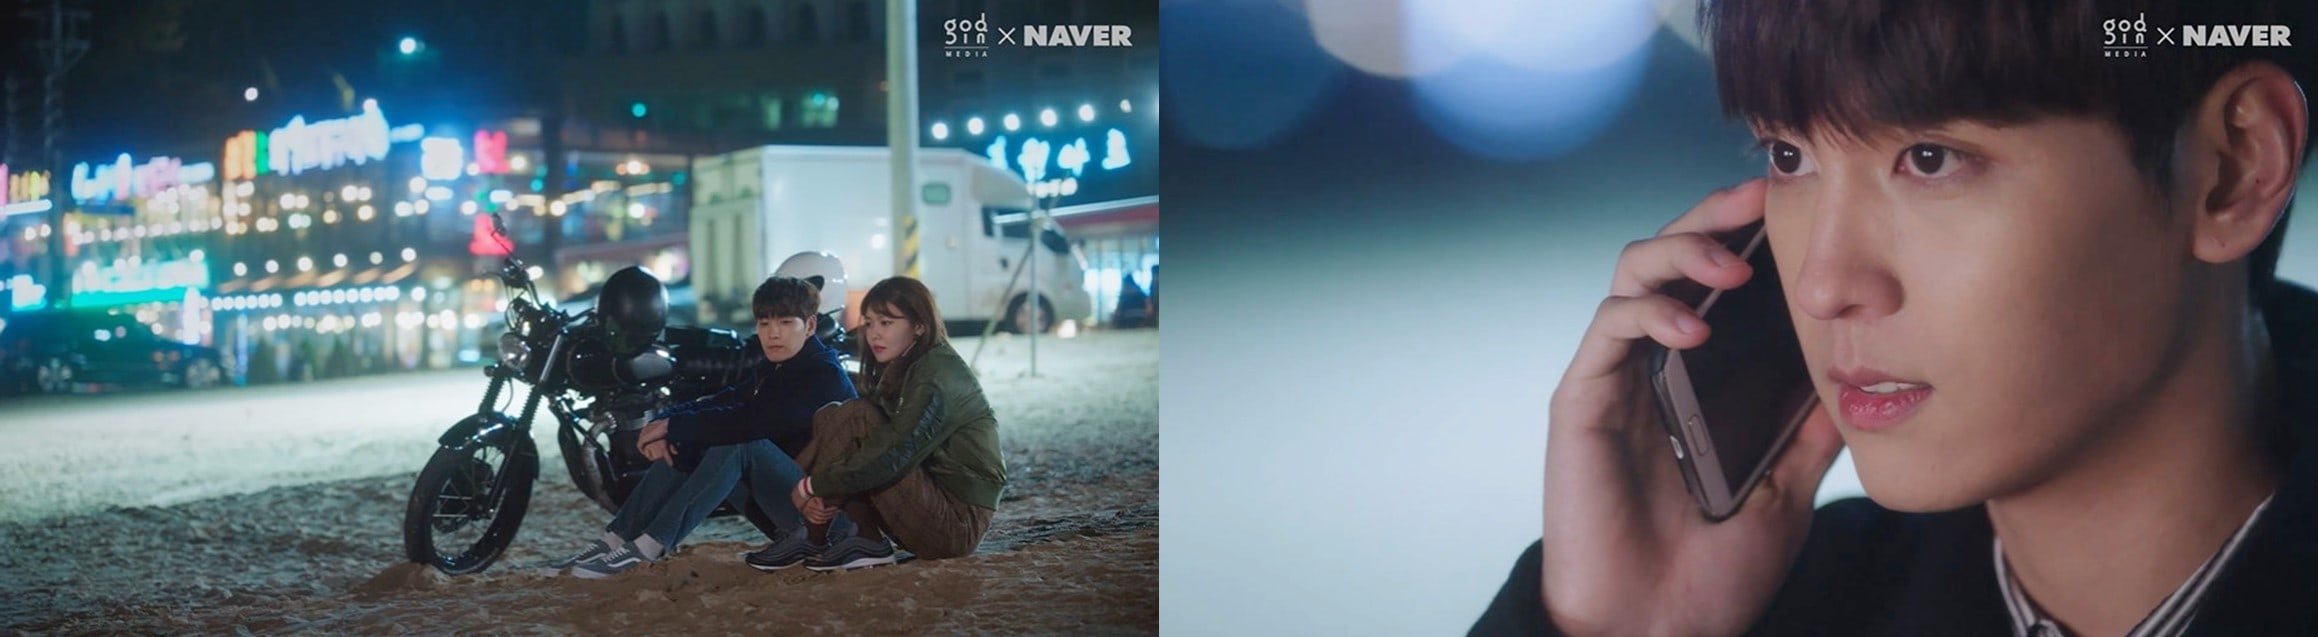 Sooyoung Choi Tae Joon 2